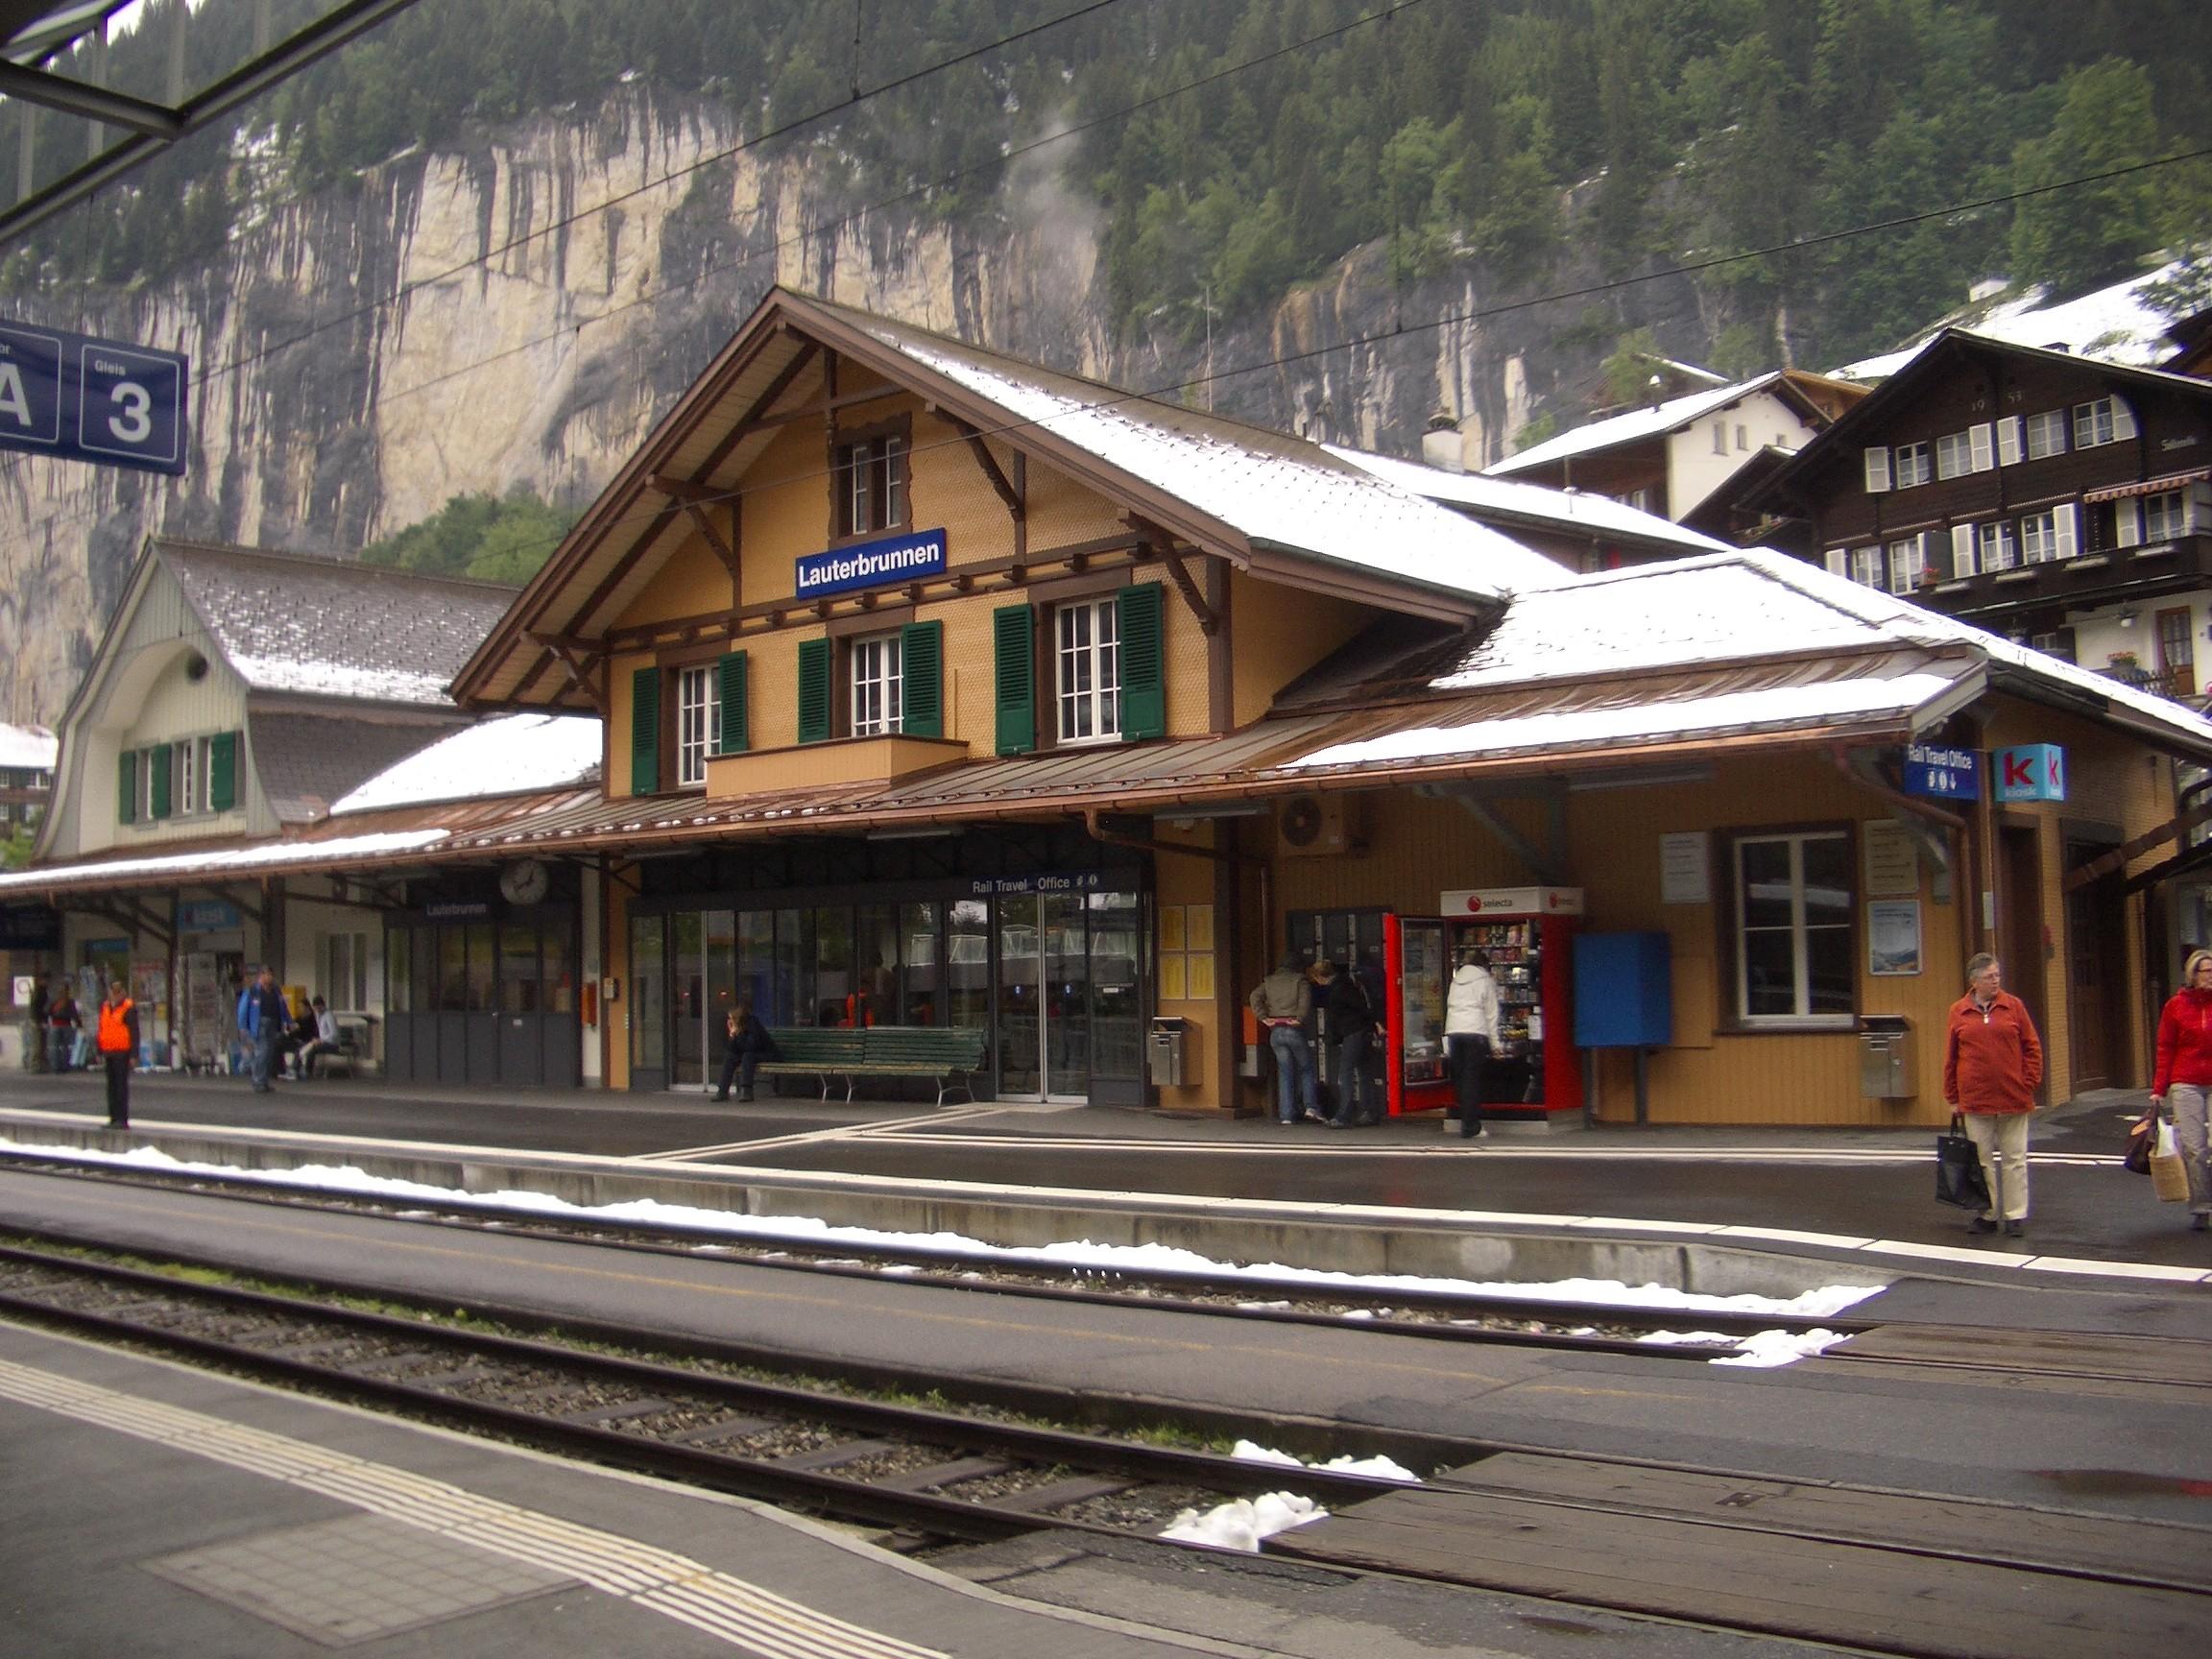 Estação de trem em Lauterbrunnen (Foto: Wikimedia Commons)